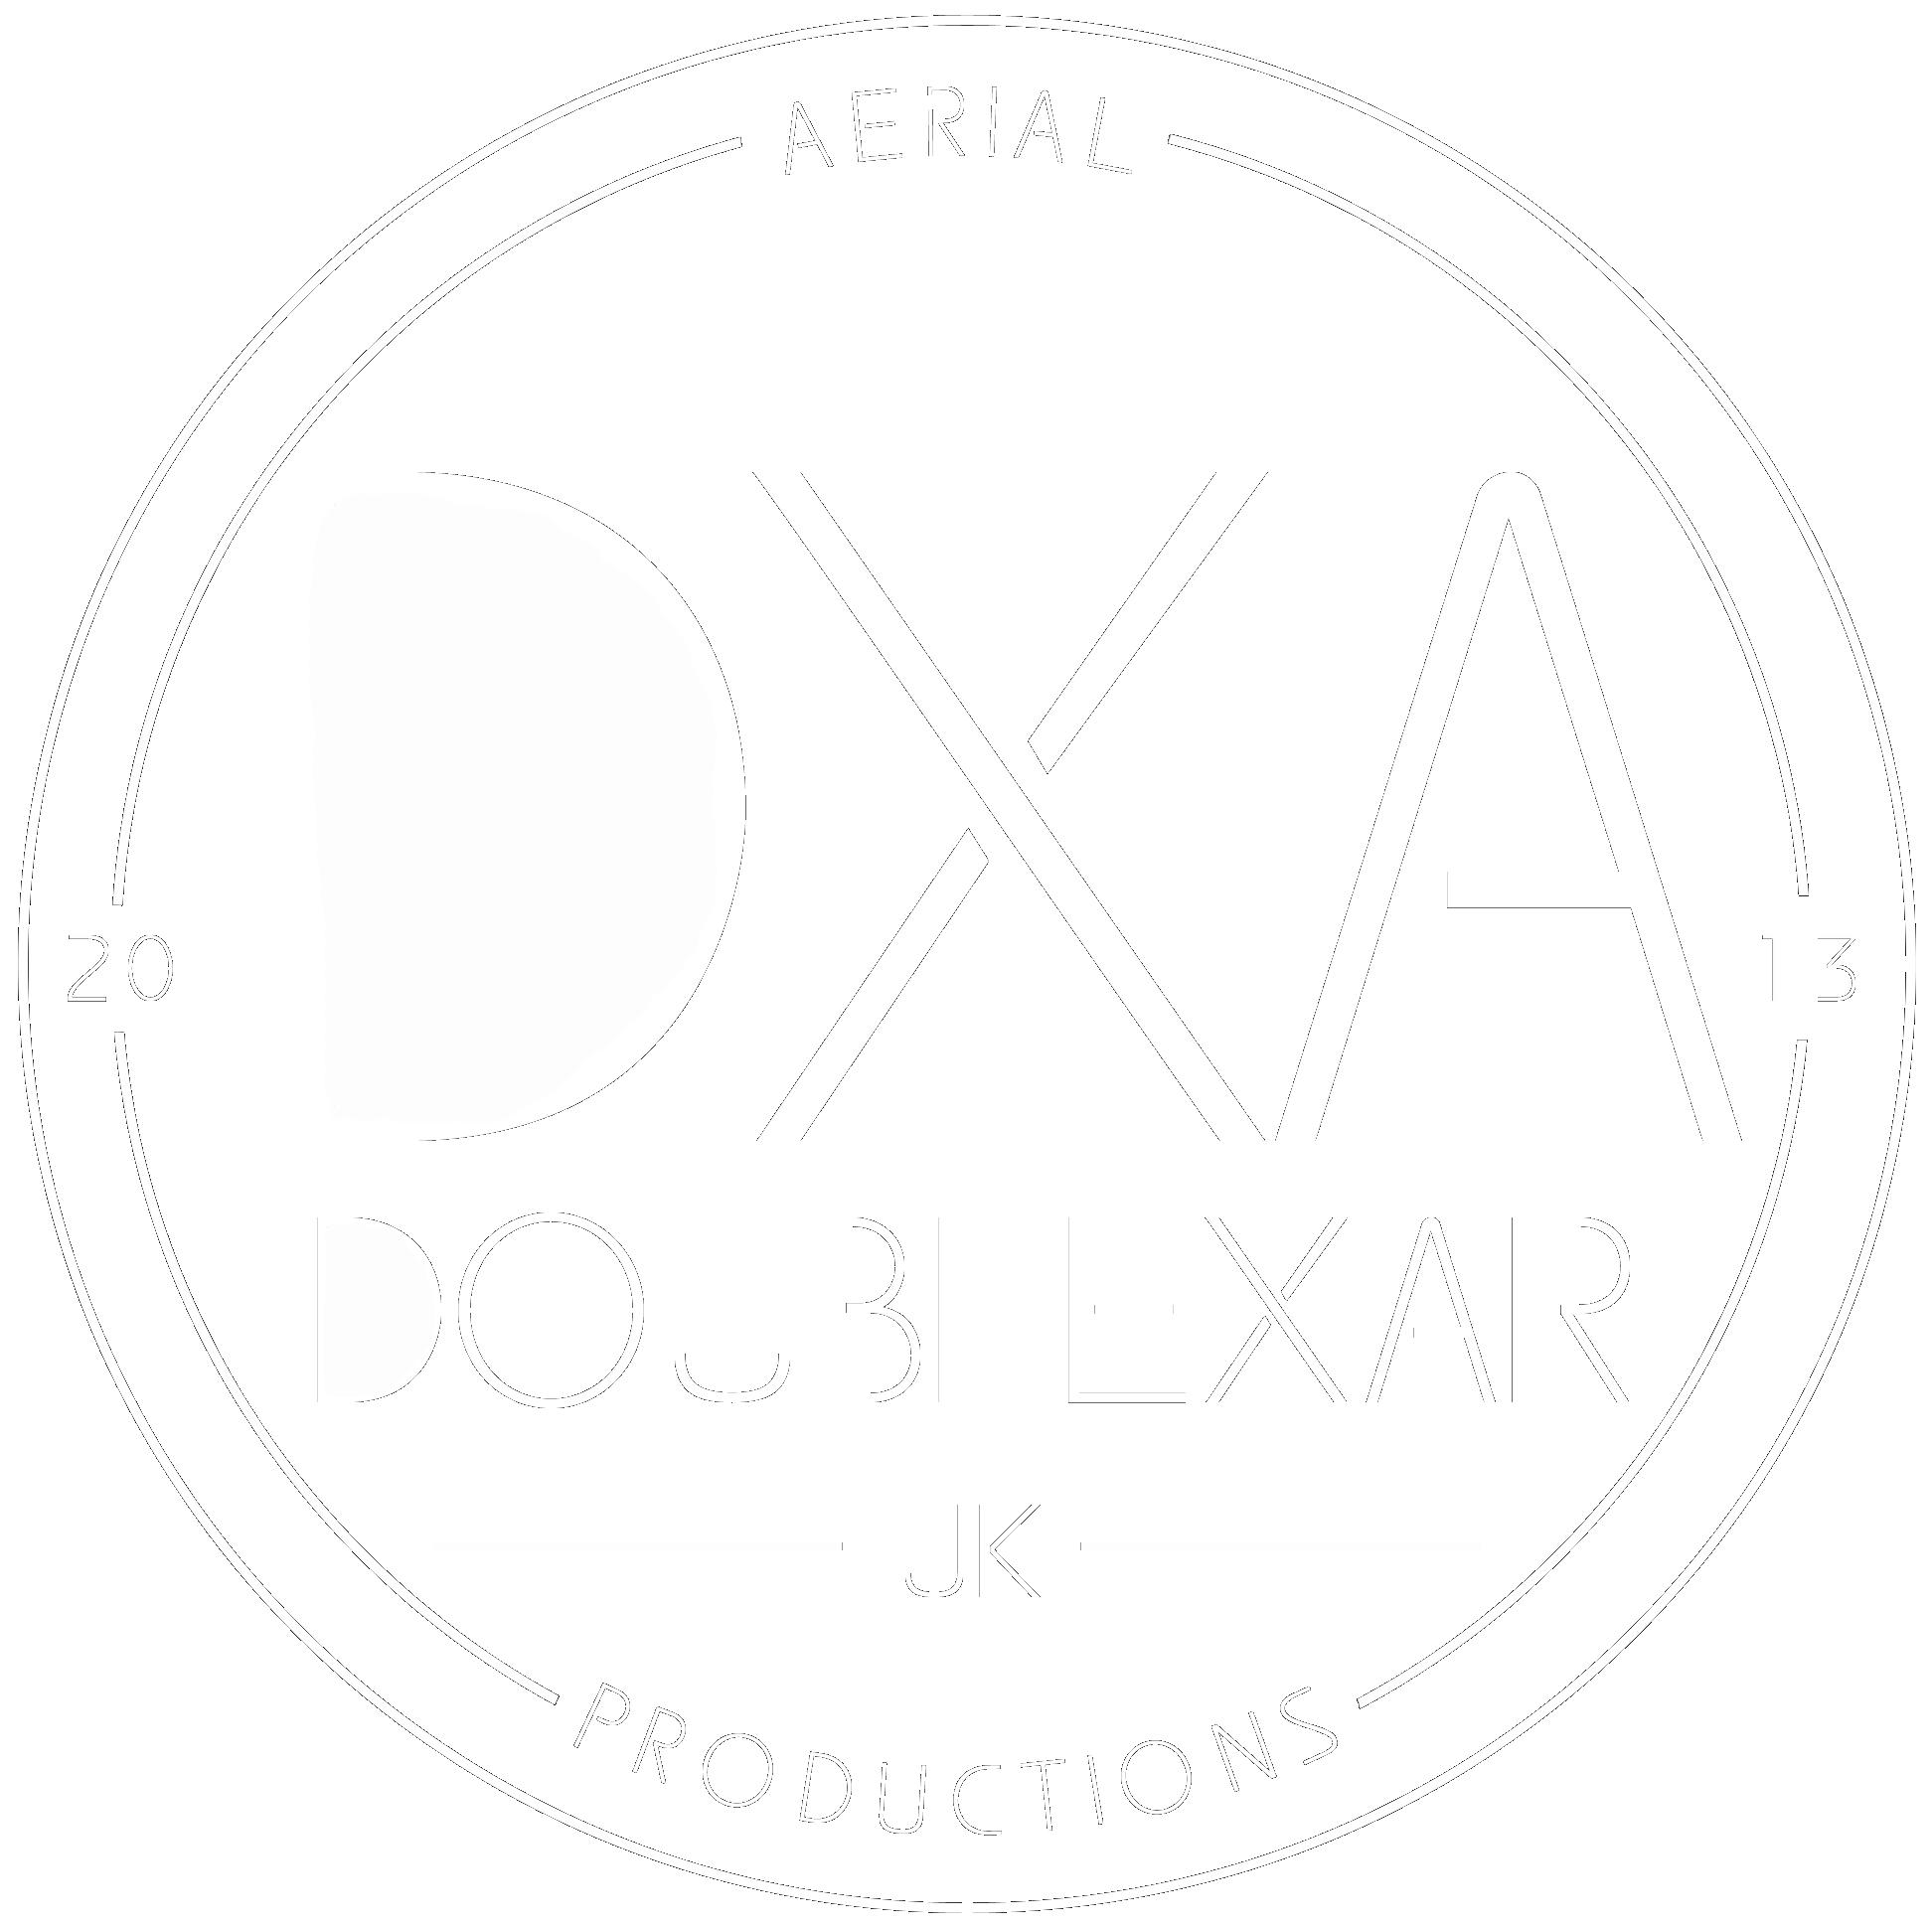 DOUBLEXAIR